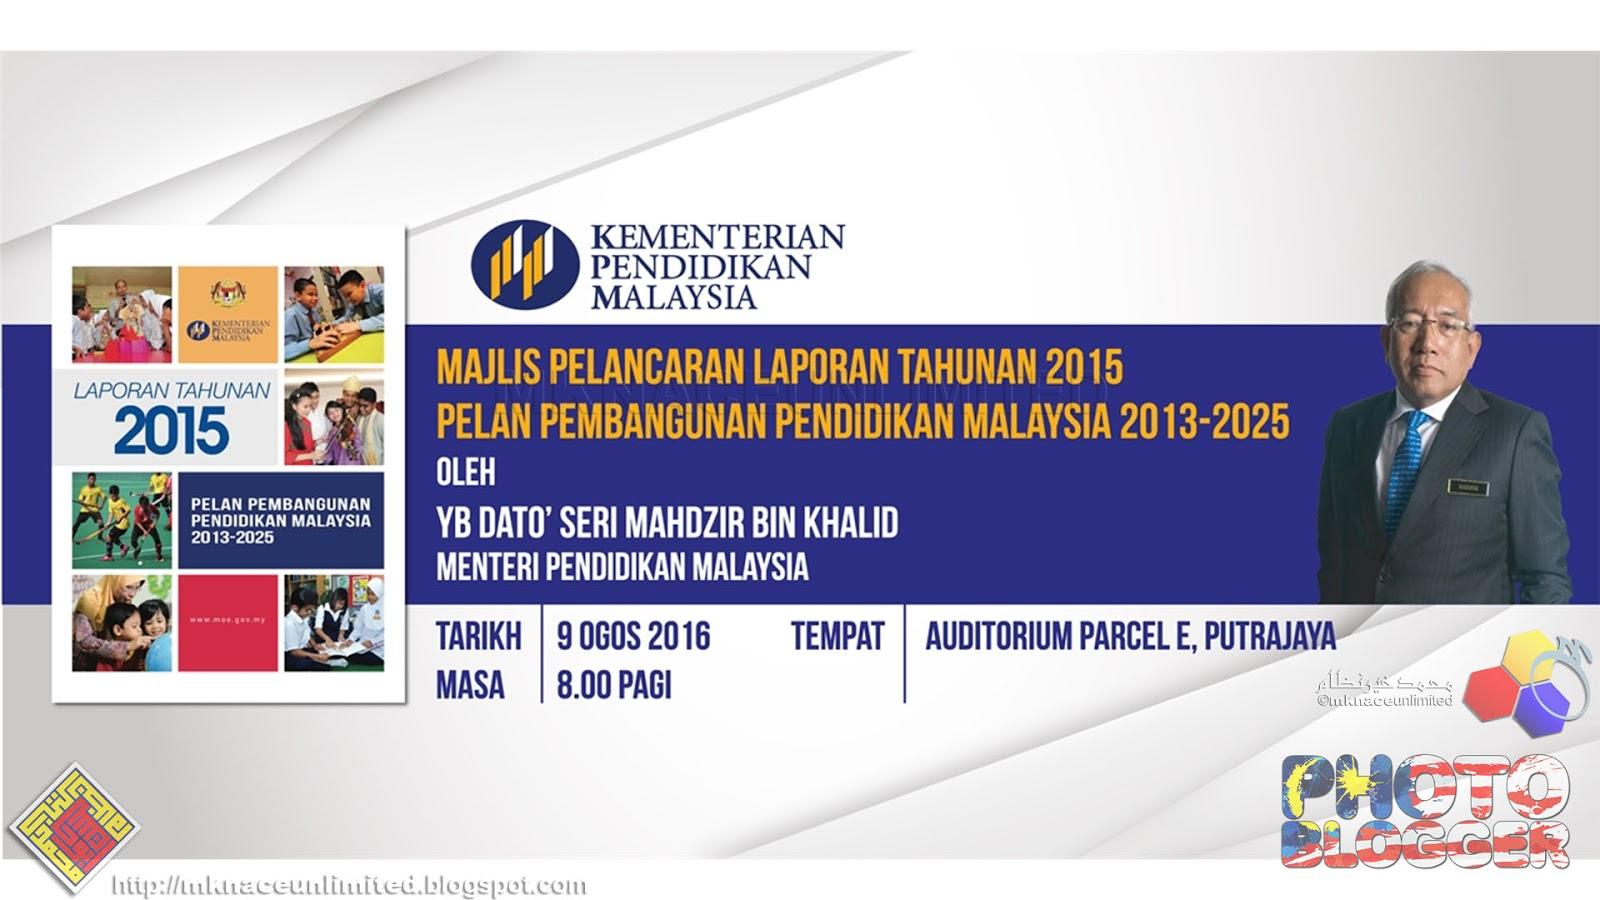 Majlis Pelancaran Laporan Tahunan 2015 Pelan Pembangunan Pendidikan Tcash Vaganza 32 Milo Malaysia Activ Go Pppm 2013 2025